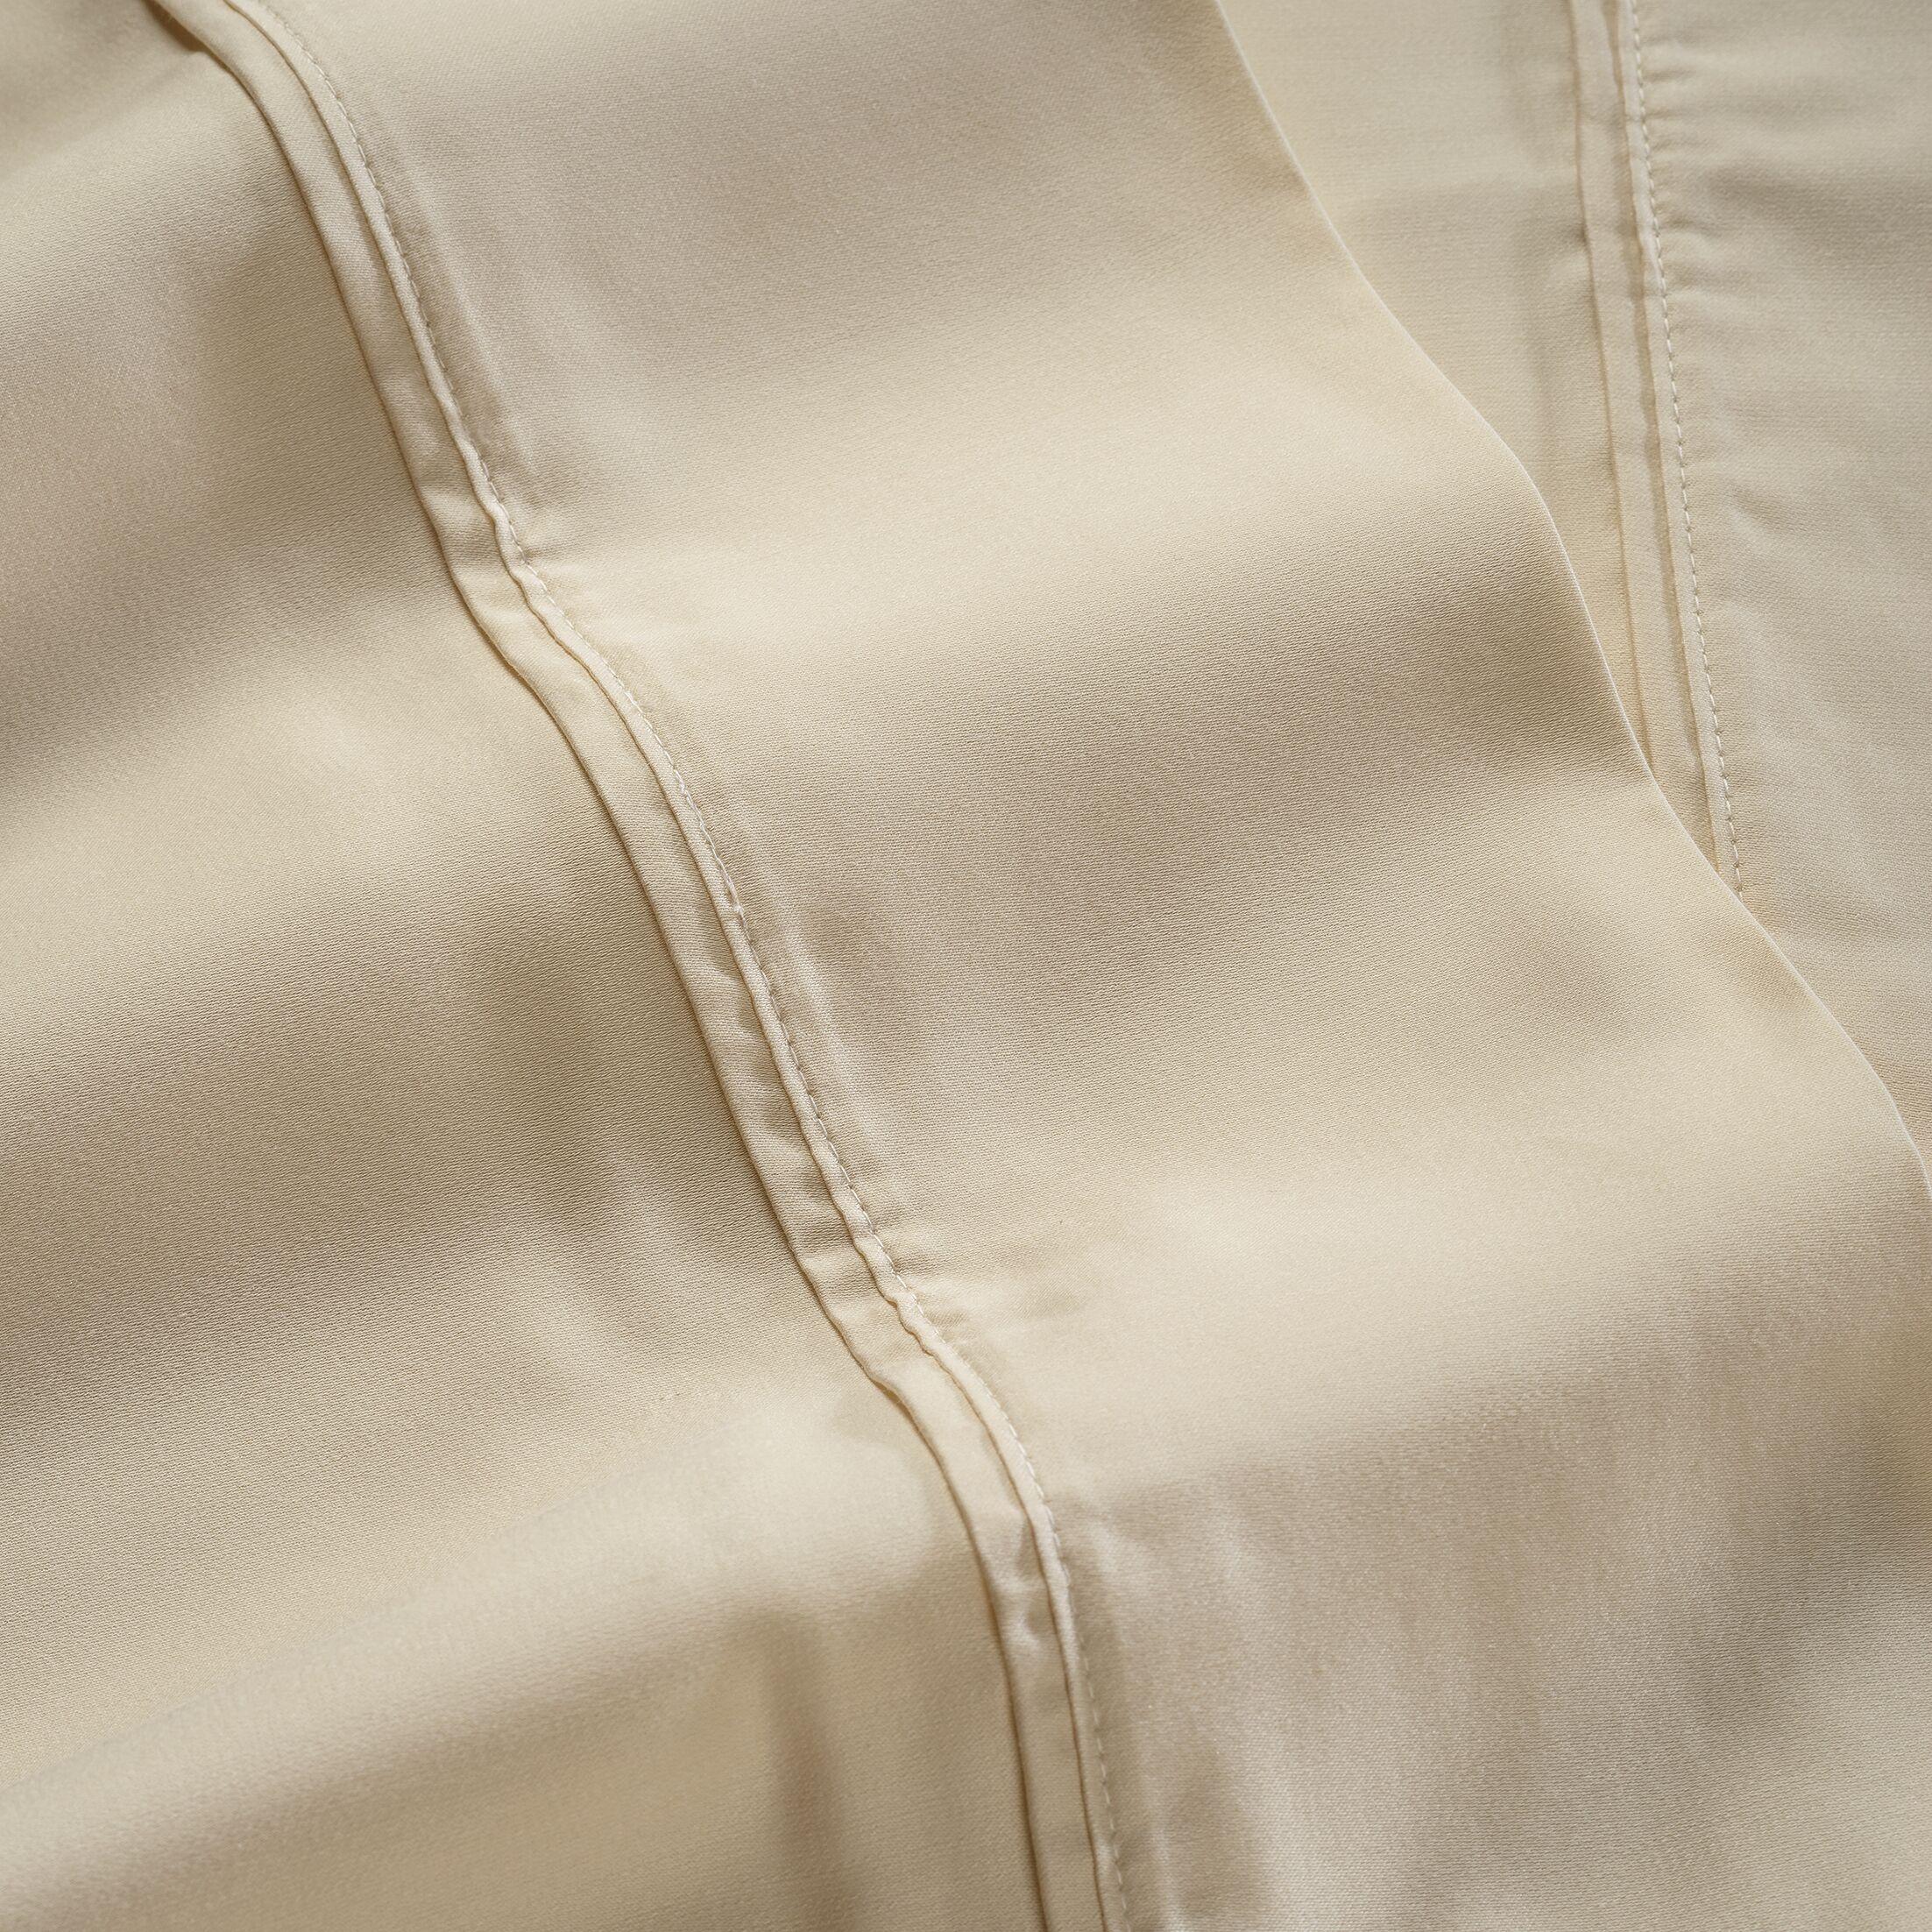 600 Thread Count 100% Tencel Sheet Set Color: Cream, Size: Queen